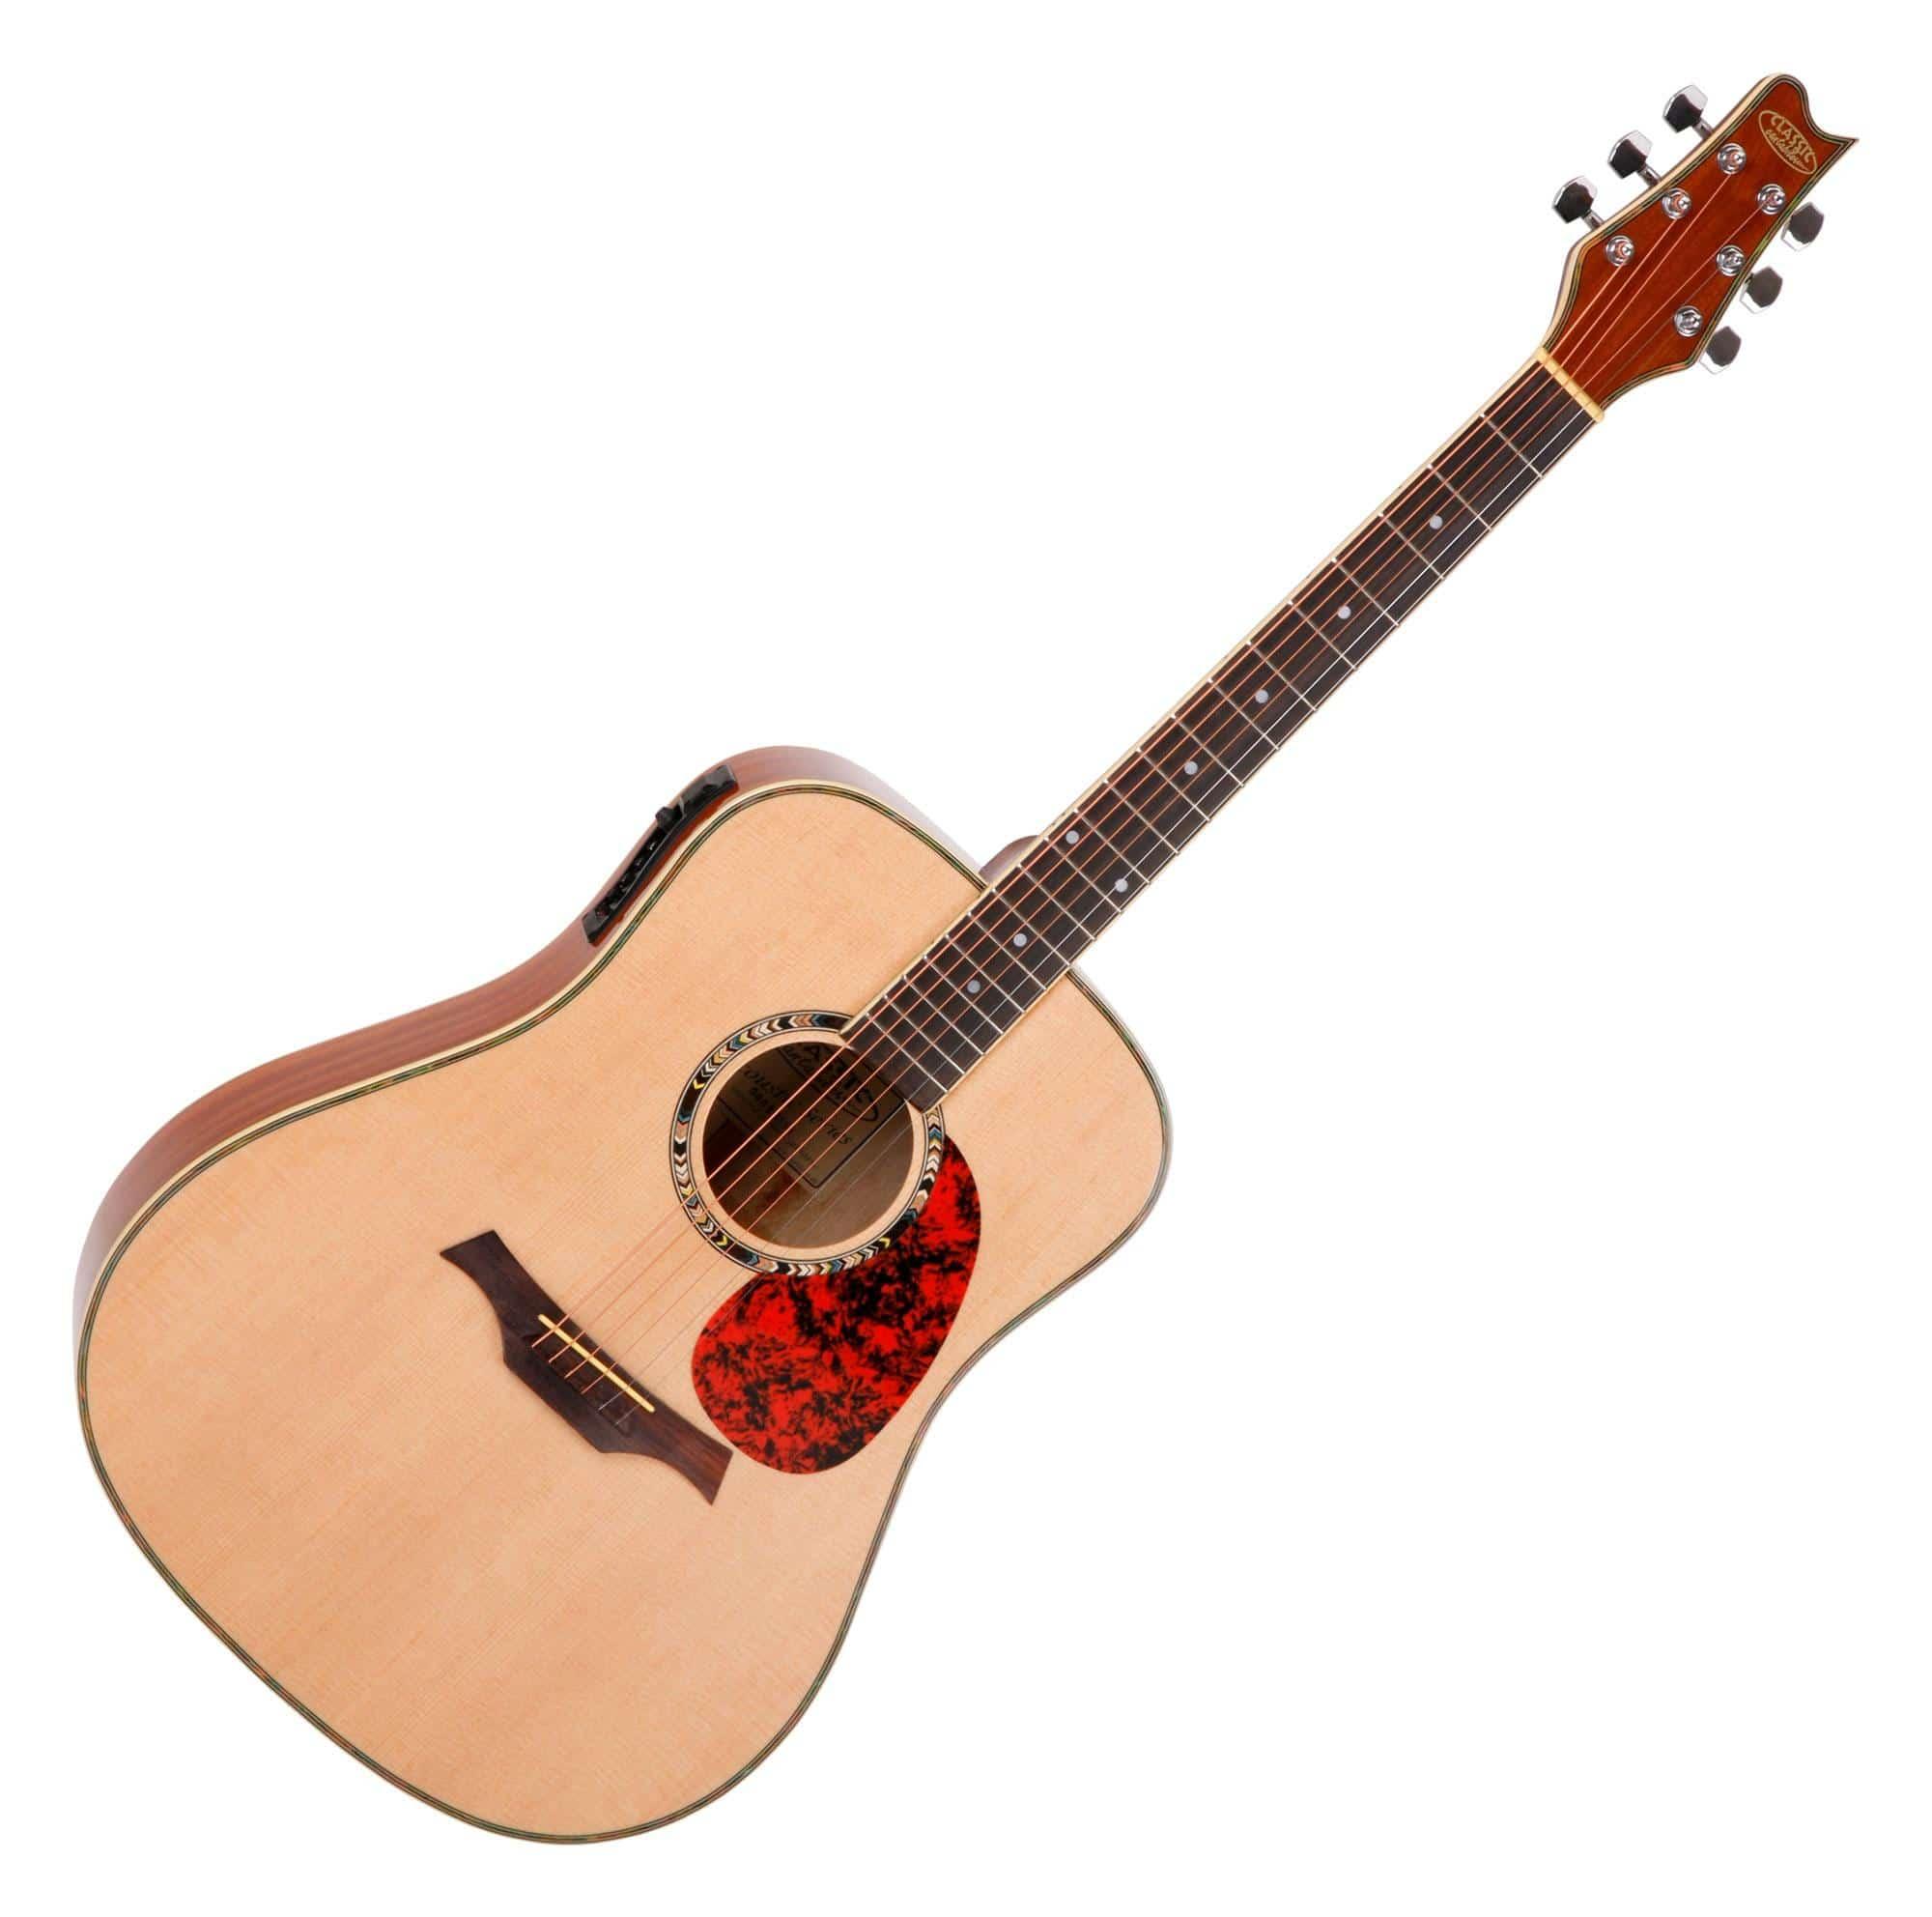 classic cantabile ws 2 steel string guitar natural. Black Bedroom Furniture Sets. Home Design Ideas